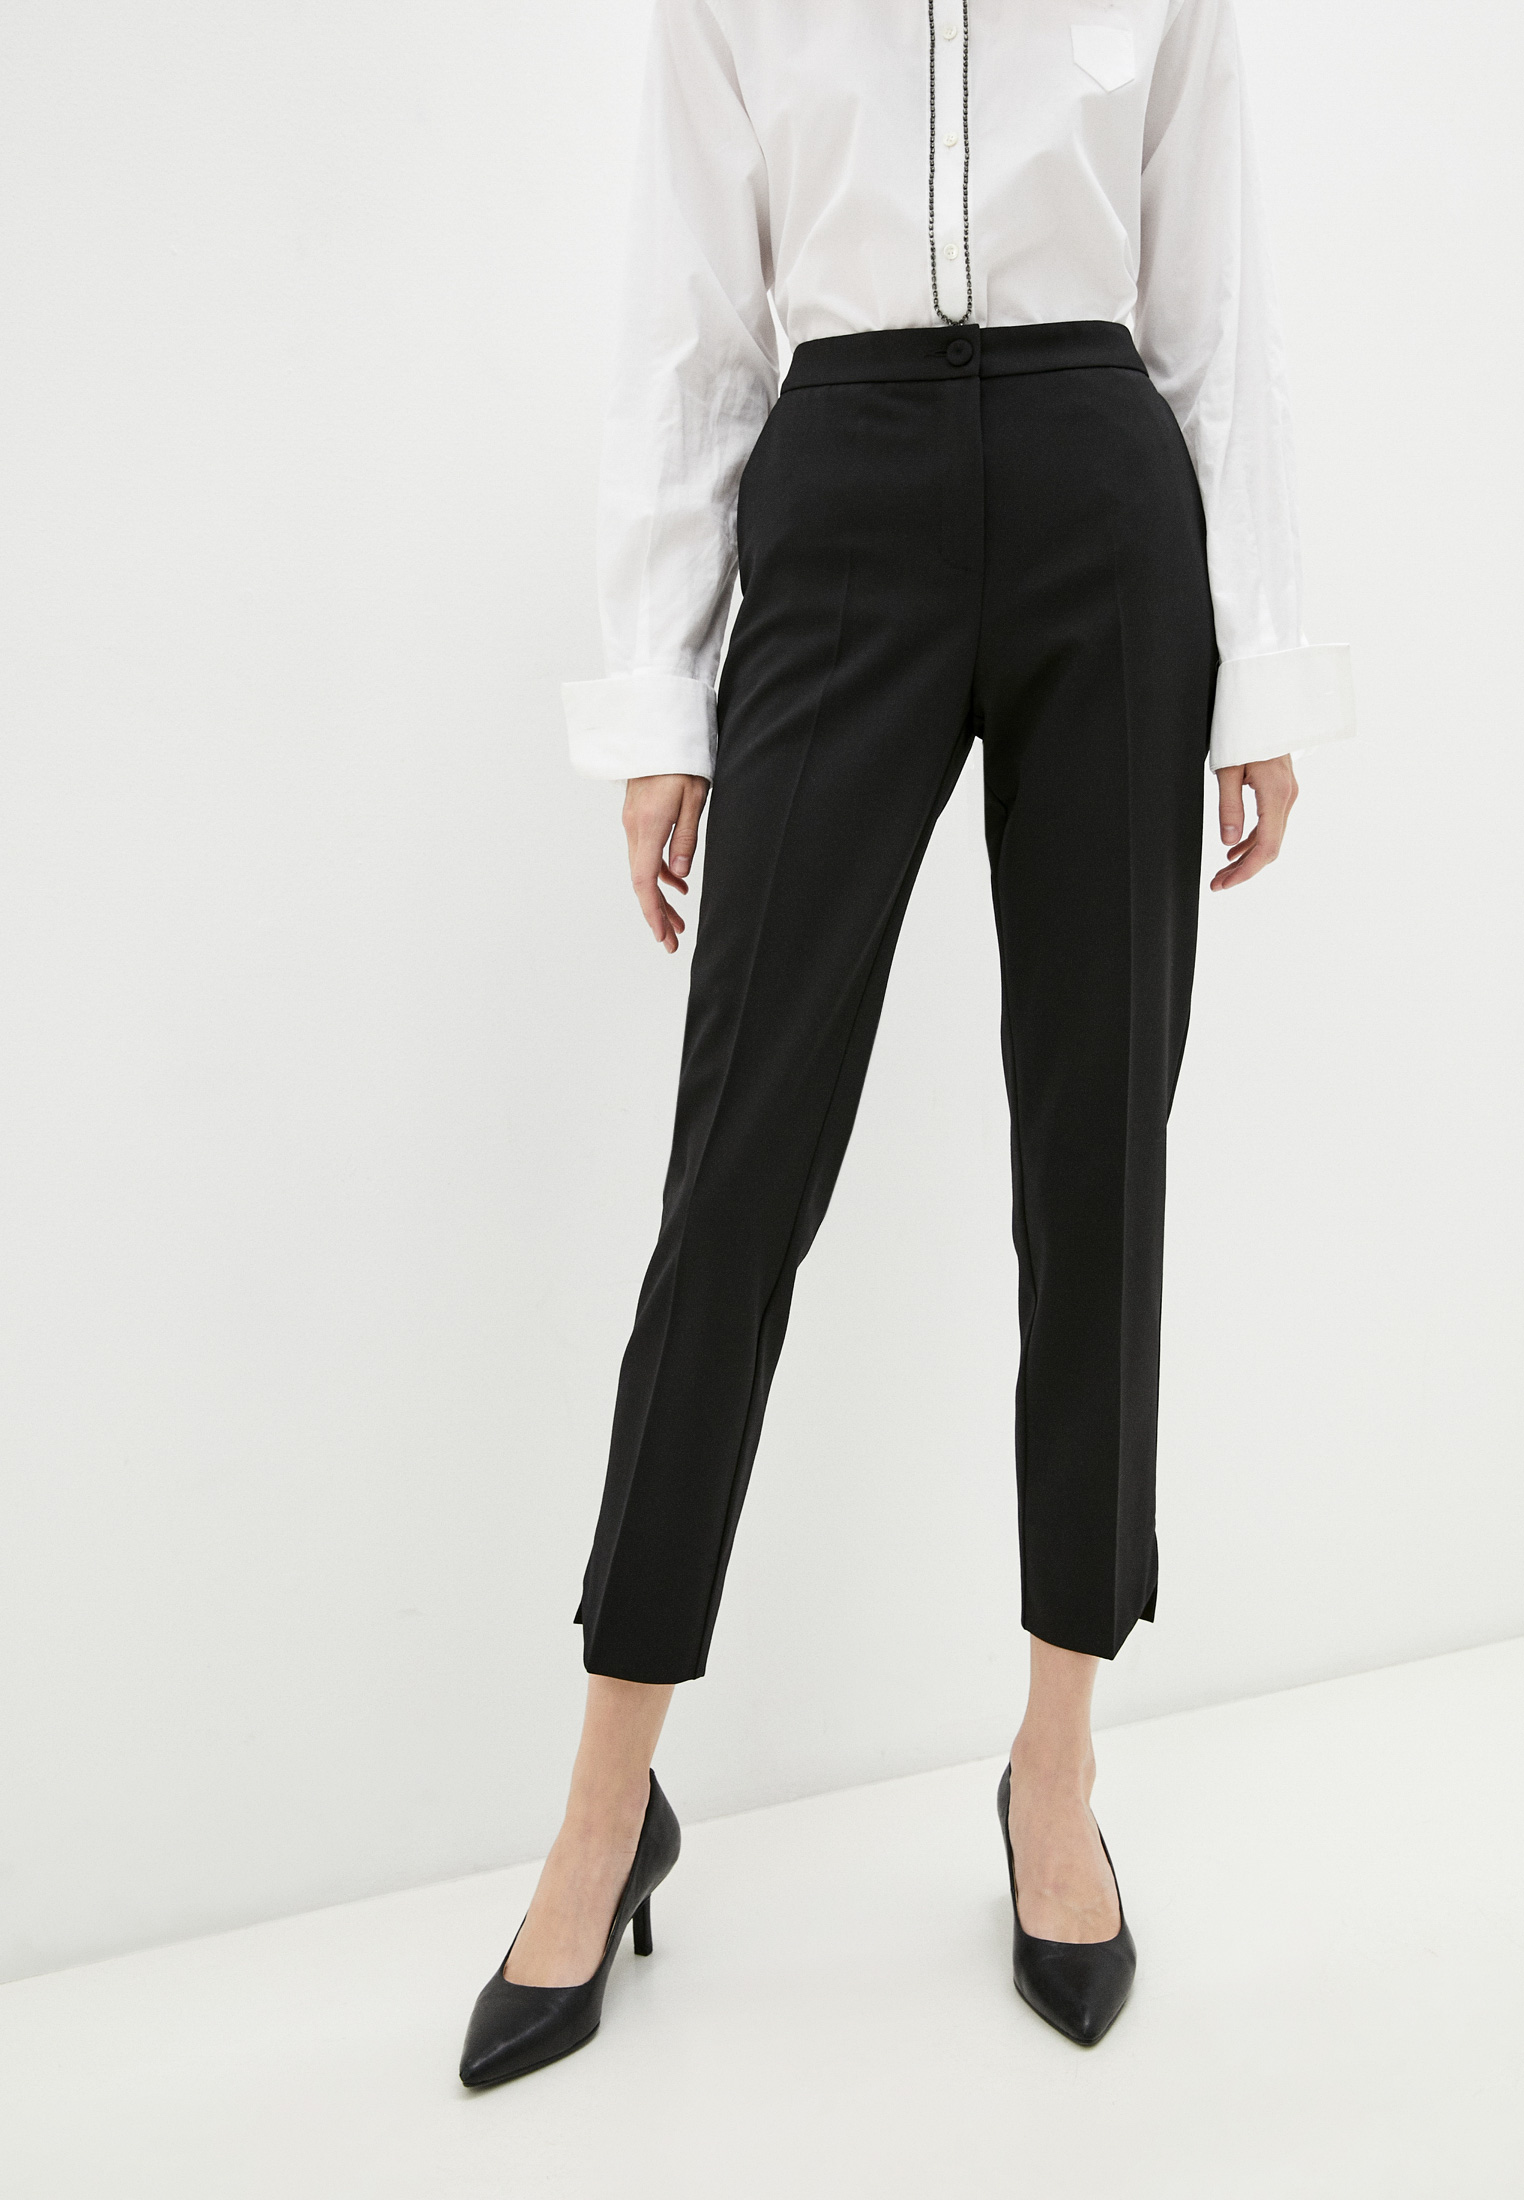 Женские классические брюки Beatrice. B 21FA1026P165